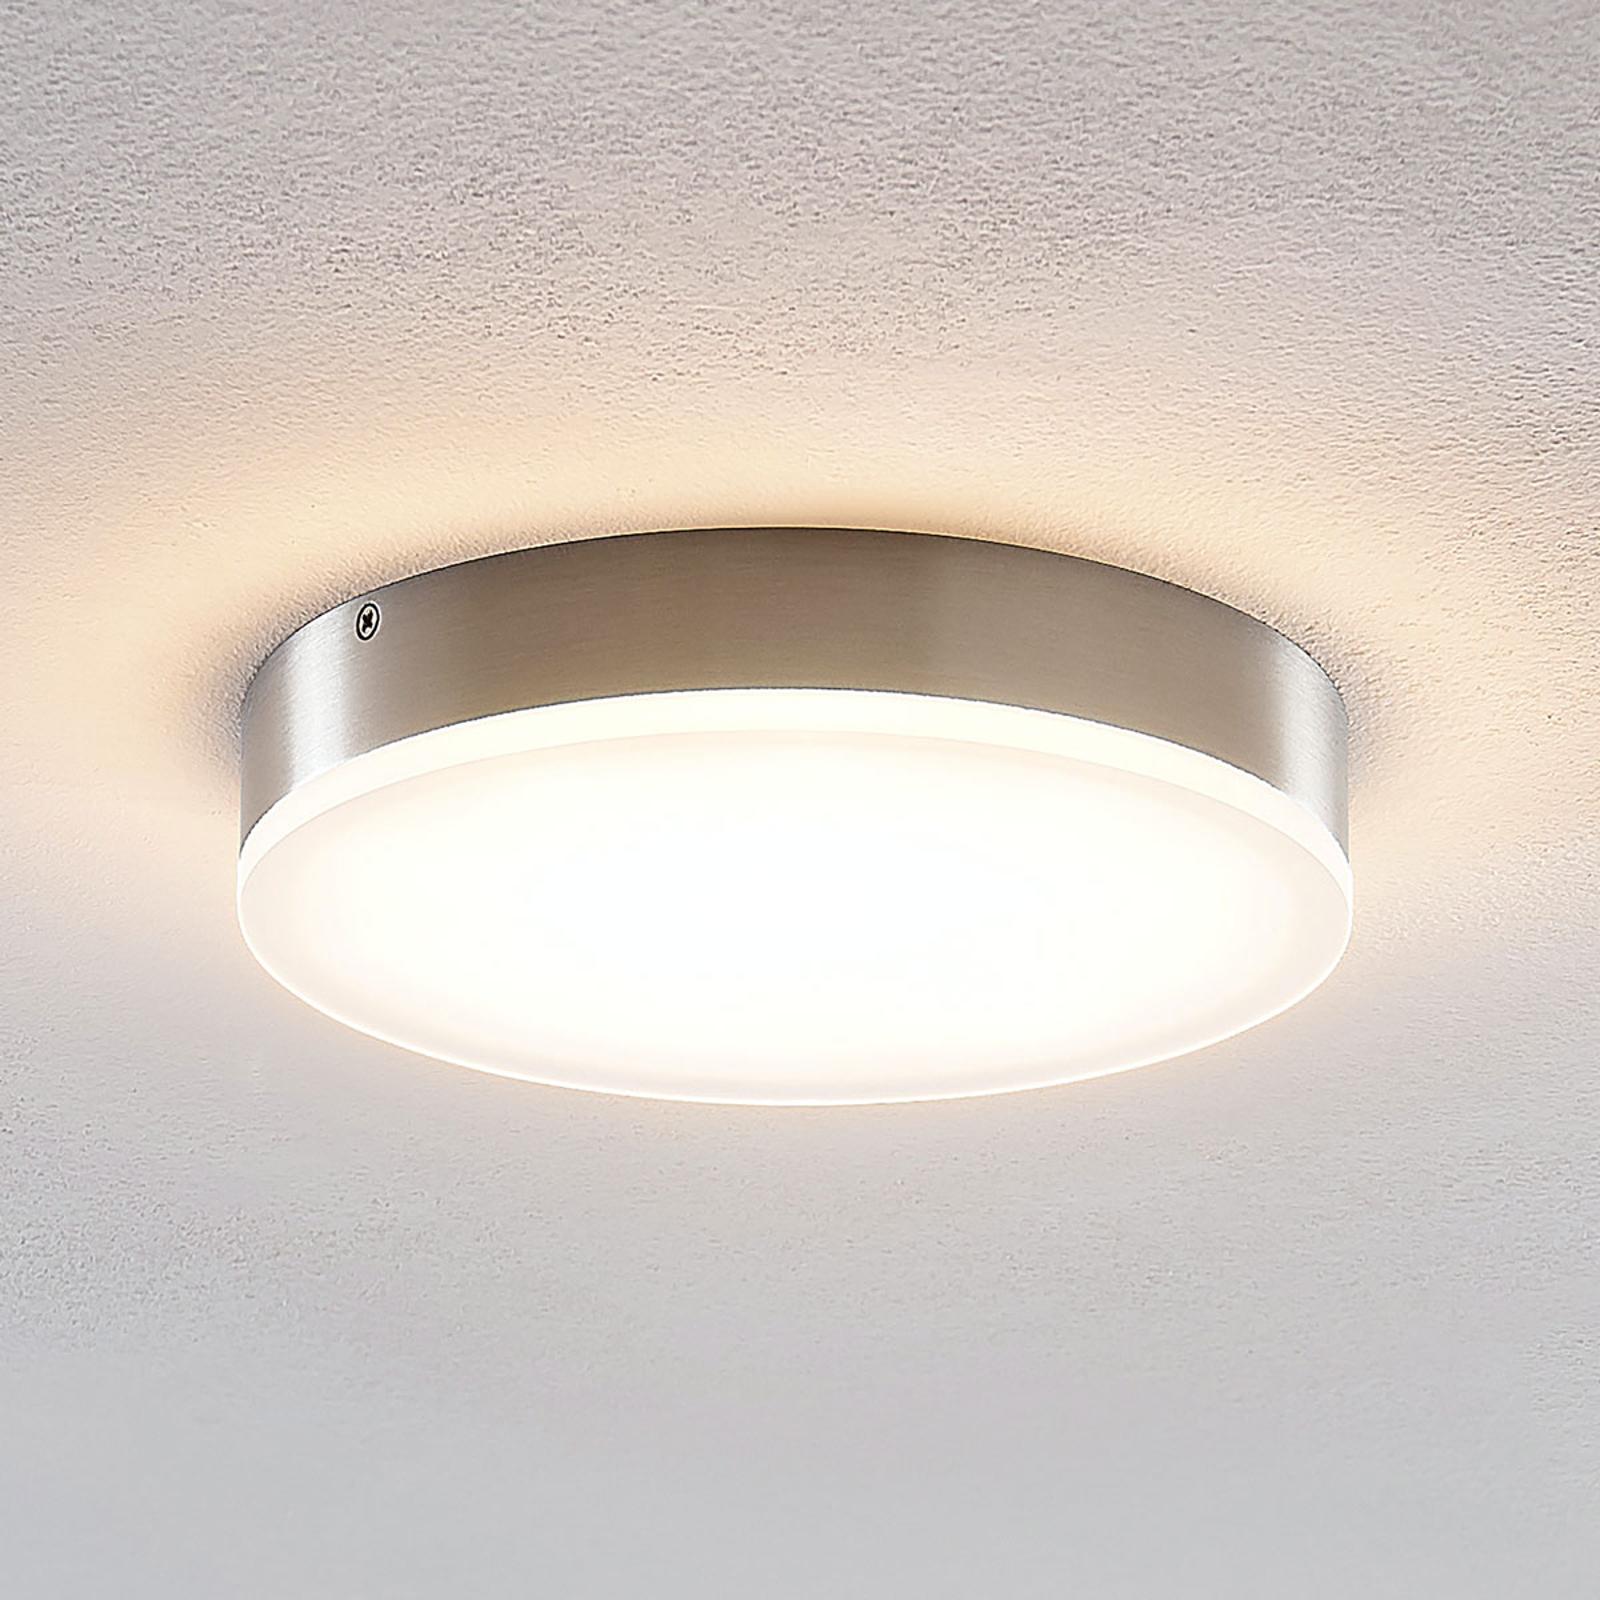 Lindby Leonta LED plafondlamp, nikkel, Ø 20 cm